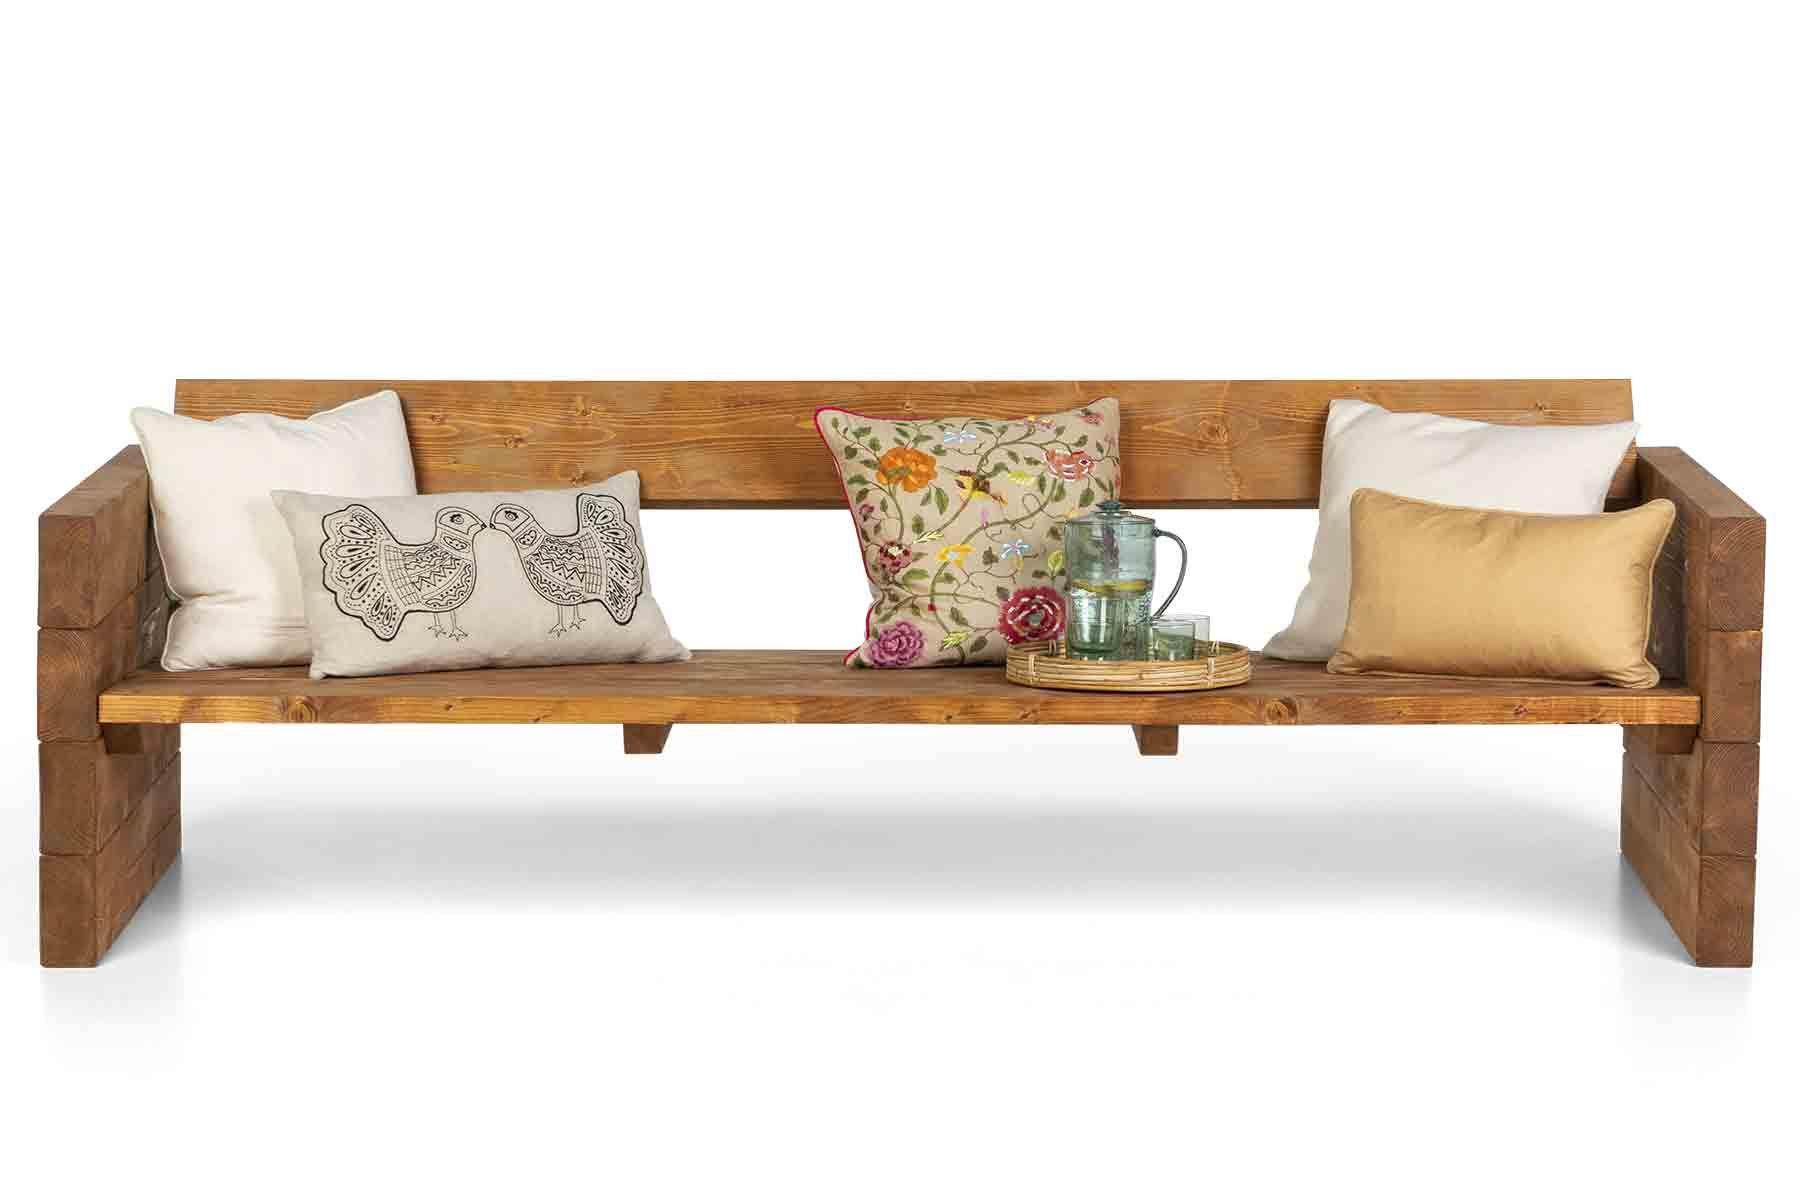 Gartenbank Jule Create By Obi Gartenbank Selber Bauen Gartenbank Outdoor Sofa